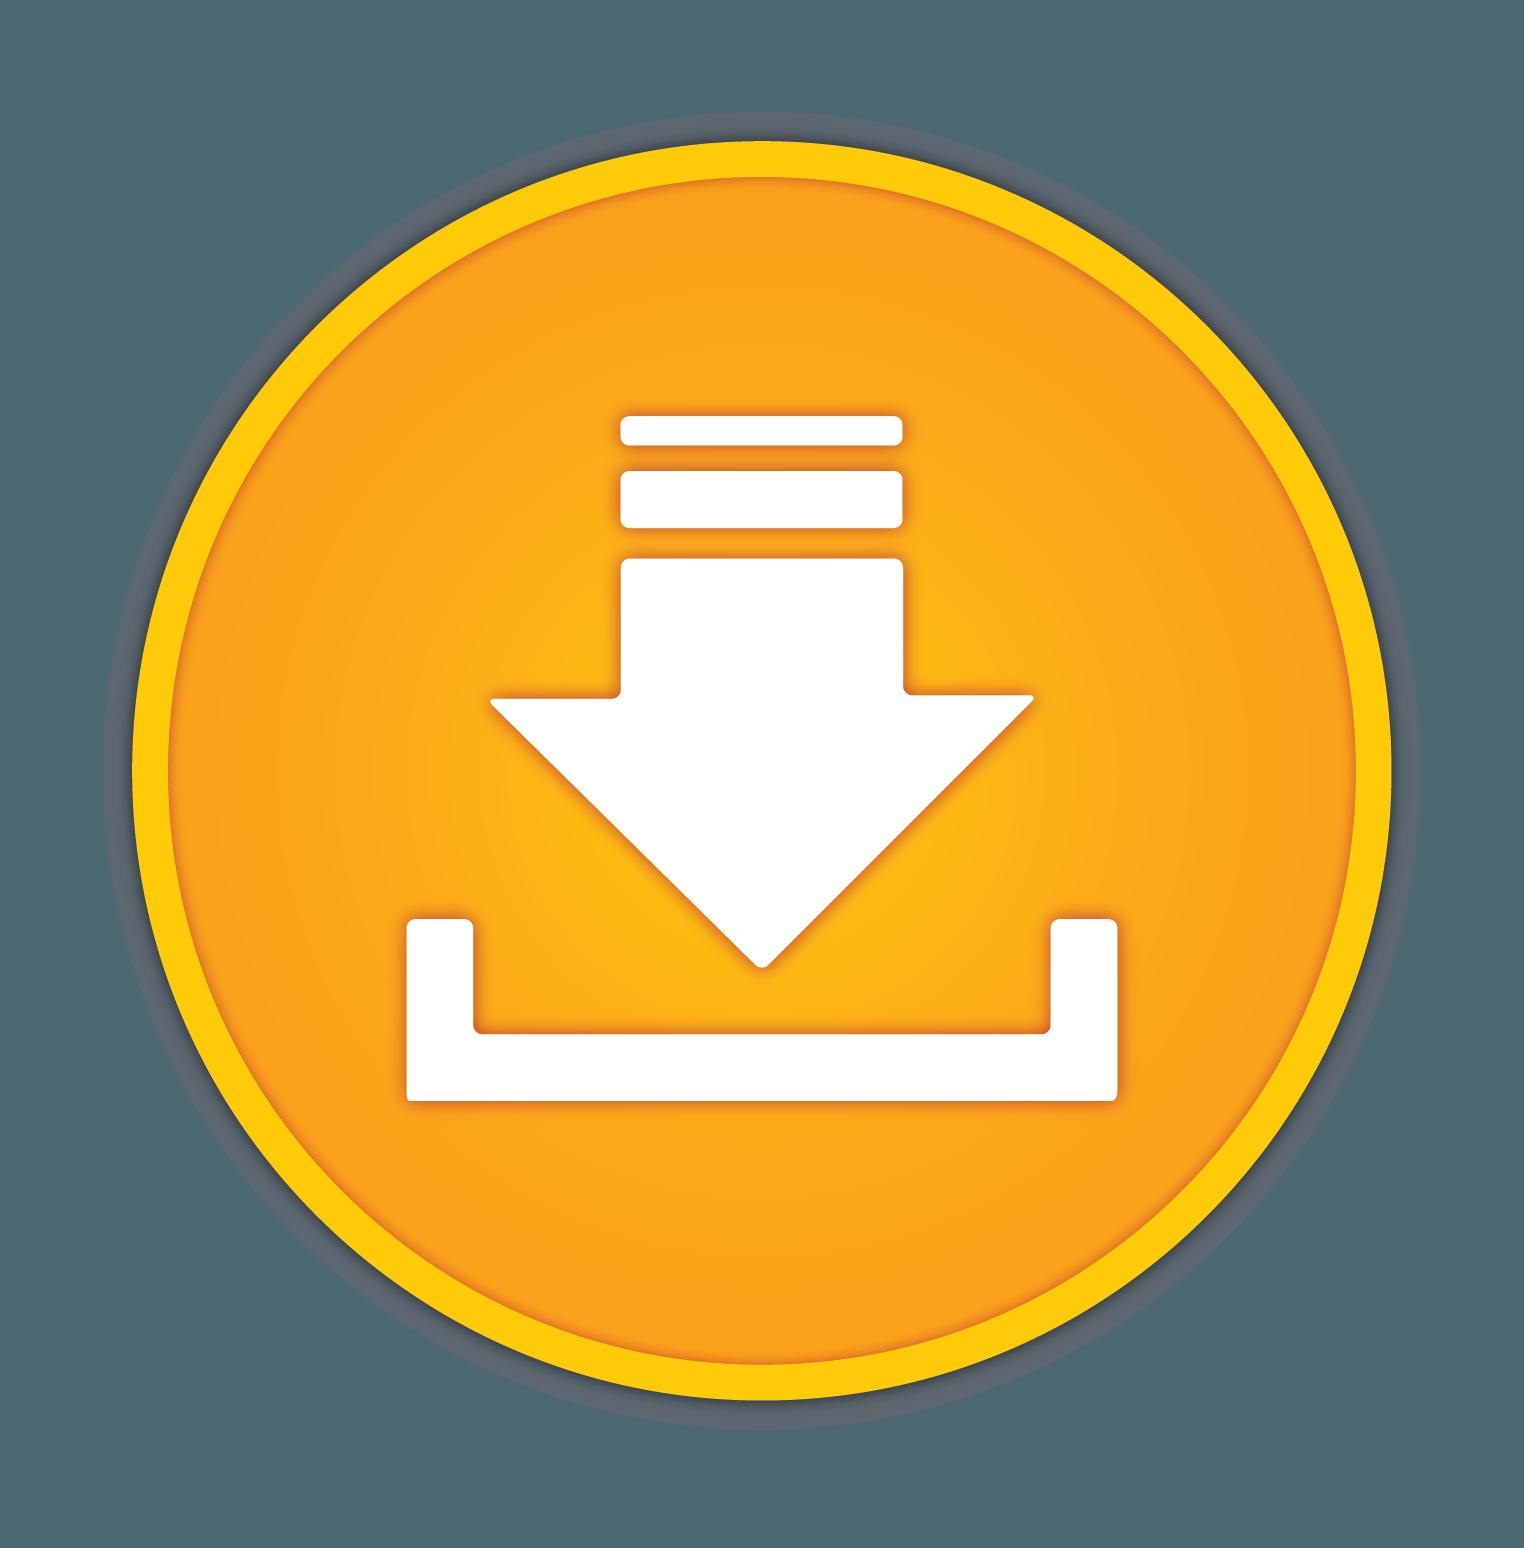 Sepa logo clipart banner freeuse Orange Circle with Line Logo - LogoDix banner freeuse